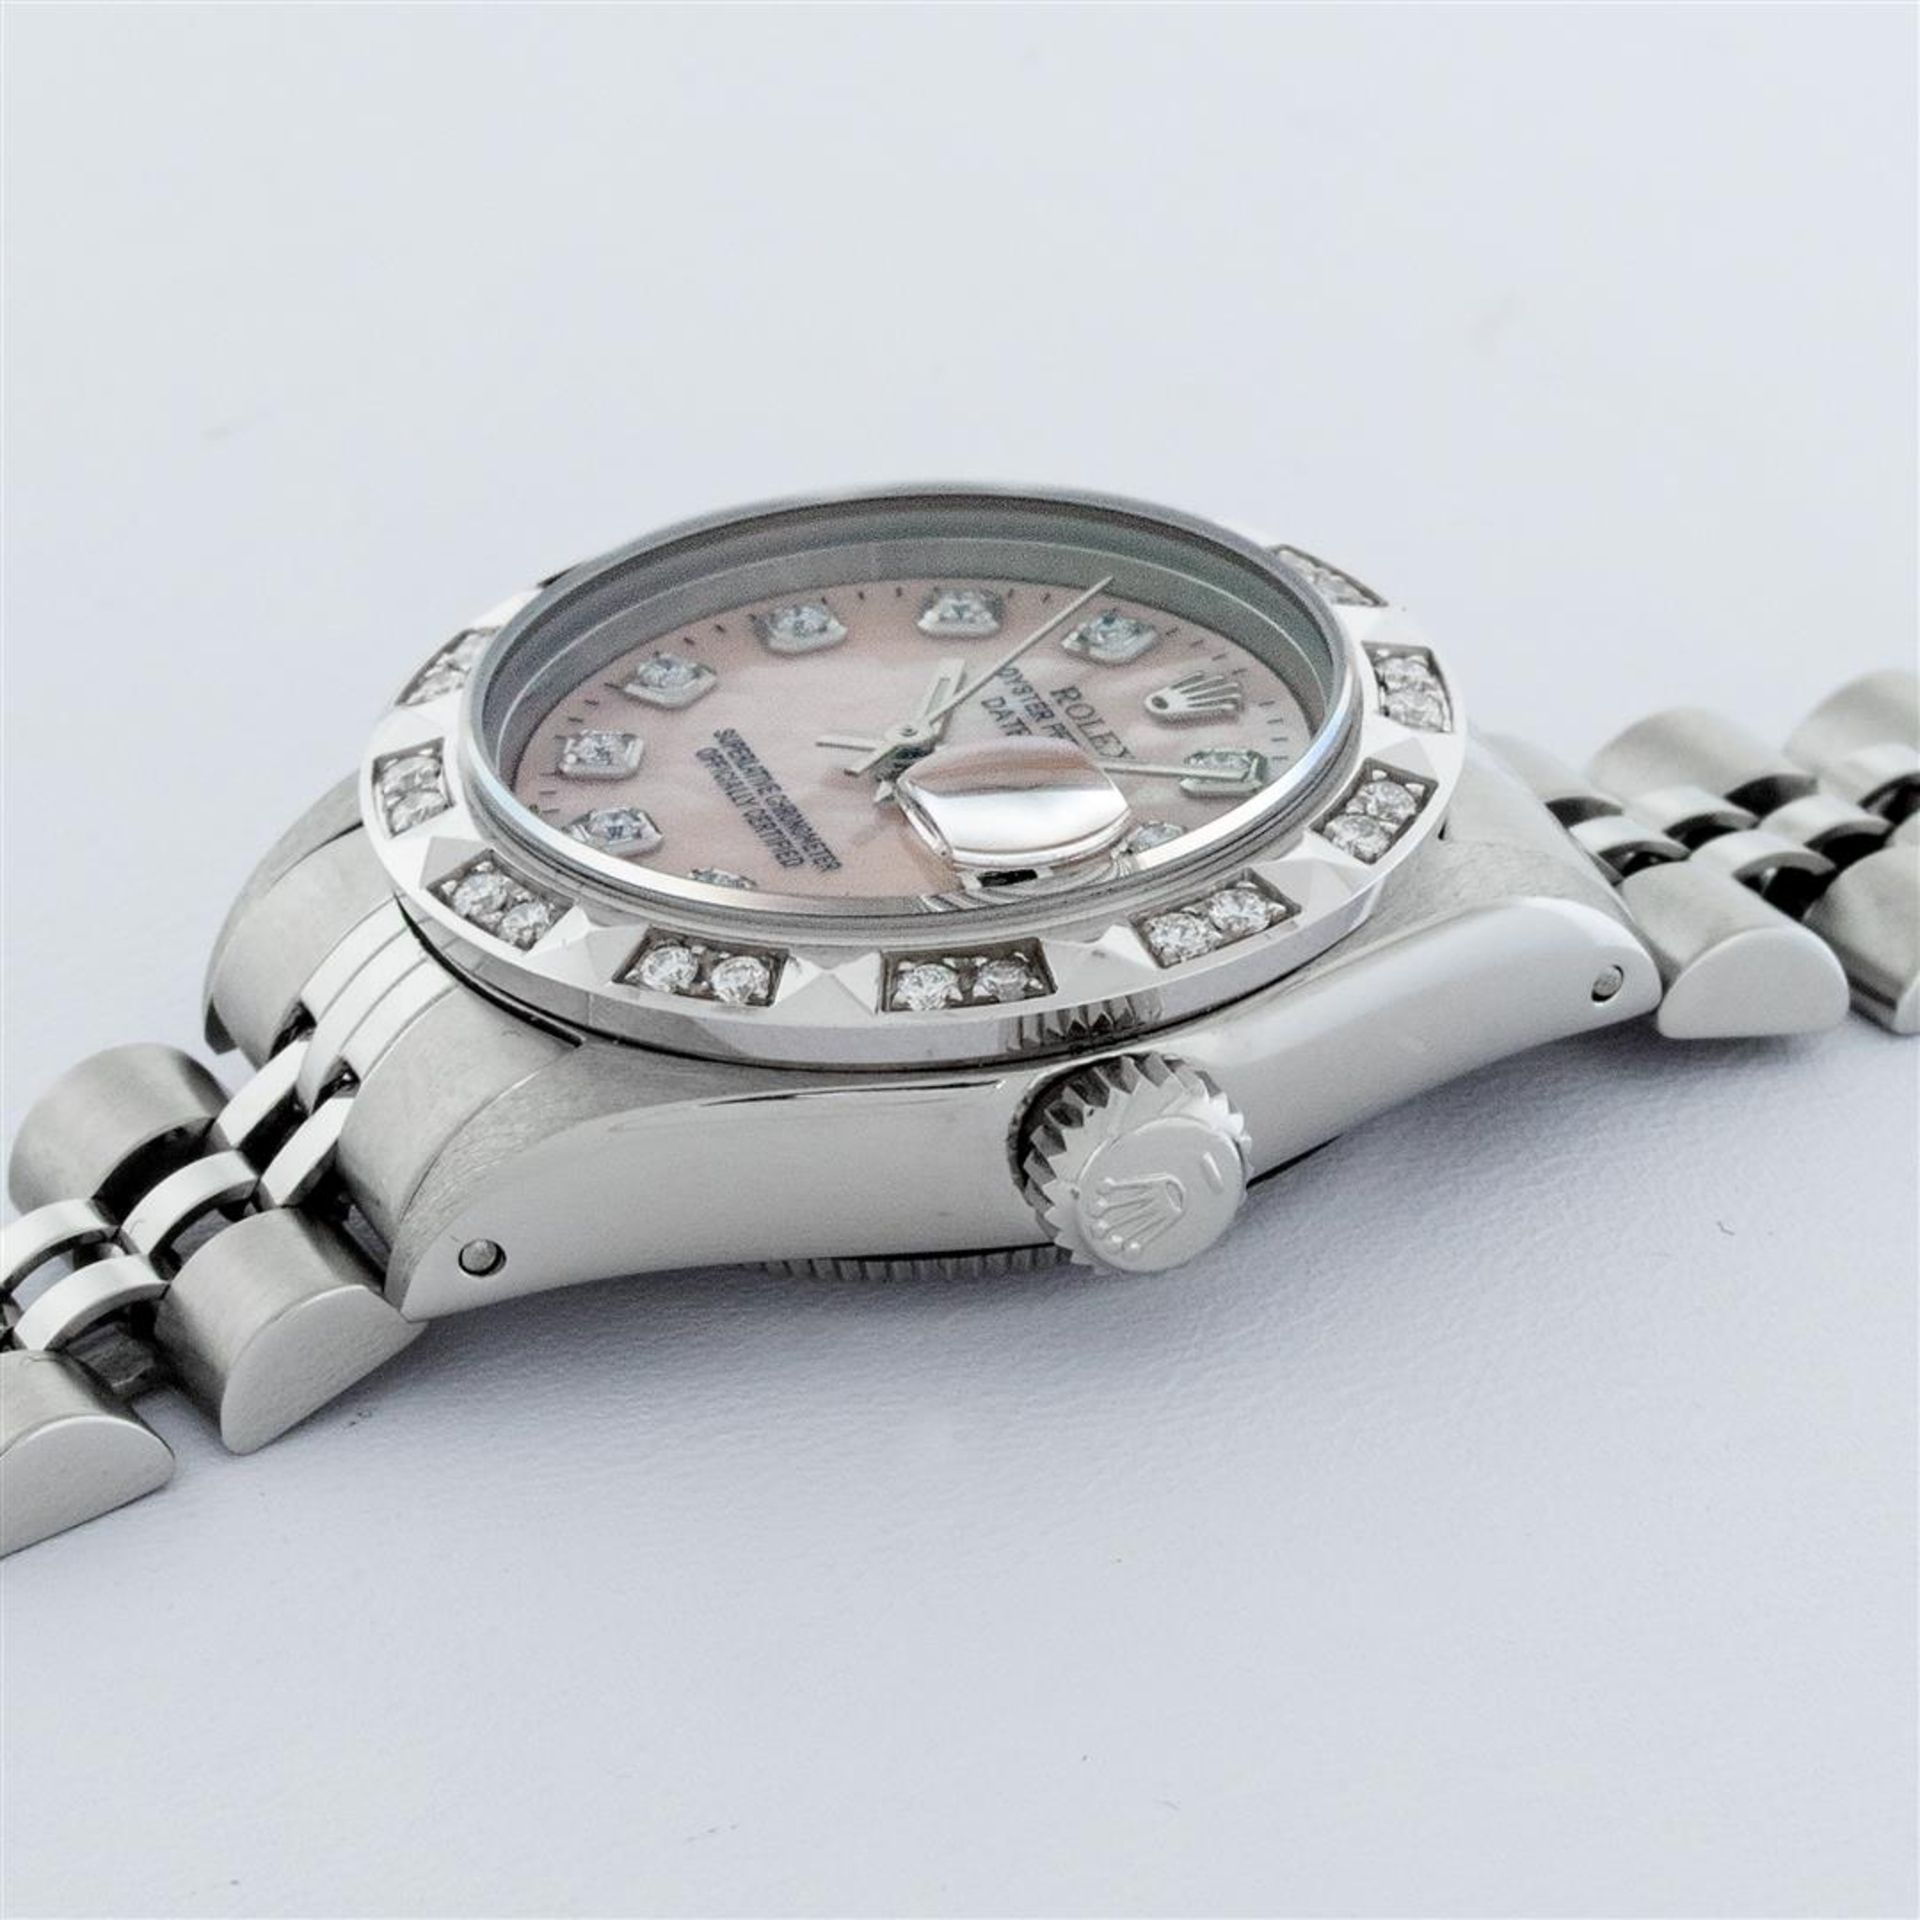 Rolex Ladies Stainless Steel Pink MOP Pyramid Diamond Datejust Wristwatch 26MM - Image 7 of 9